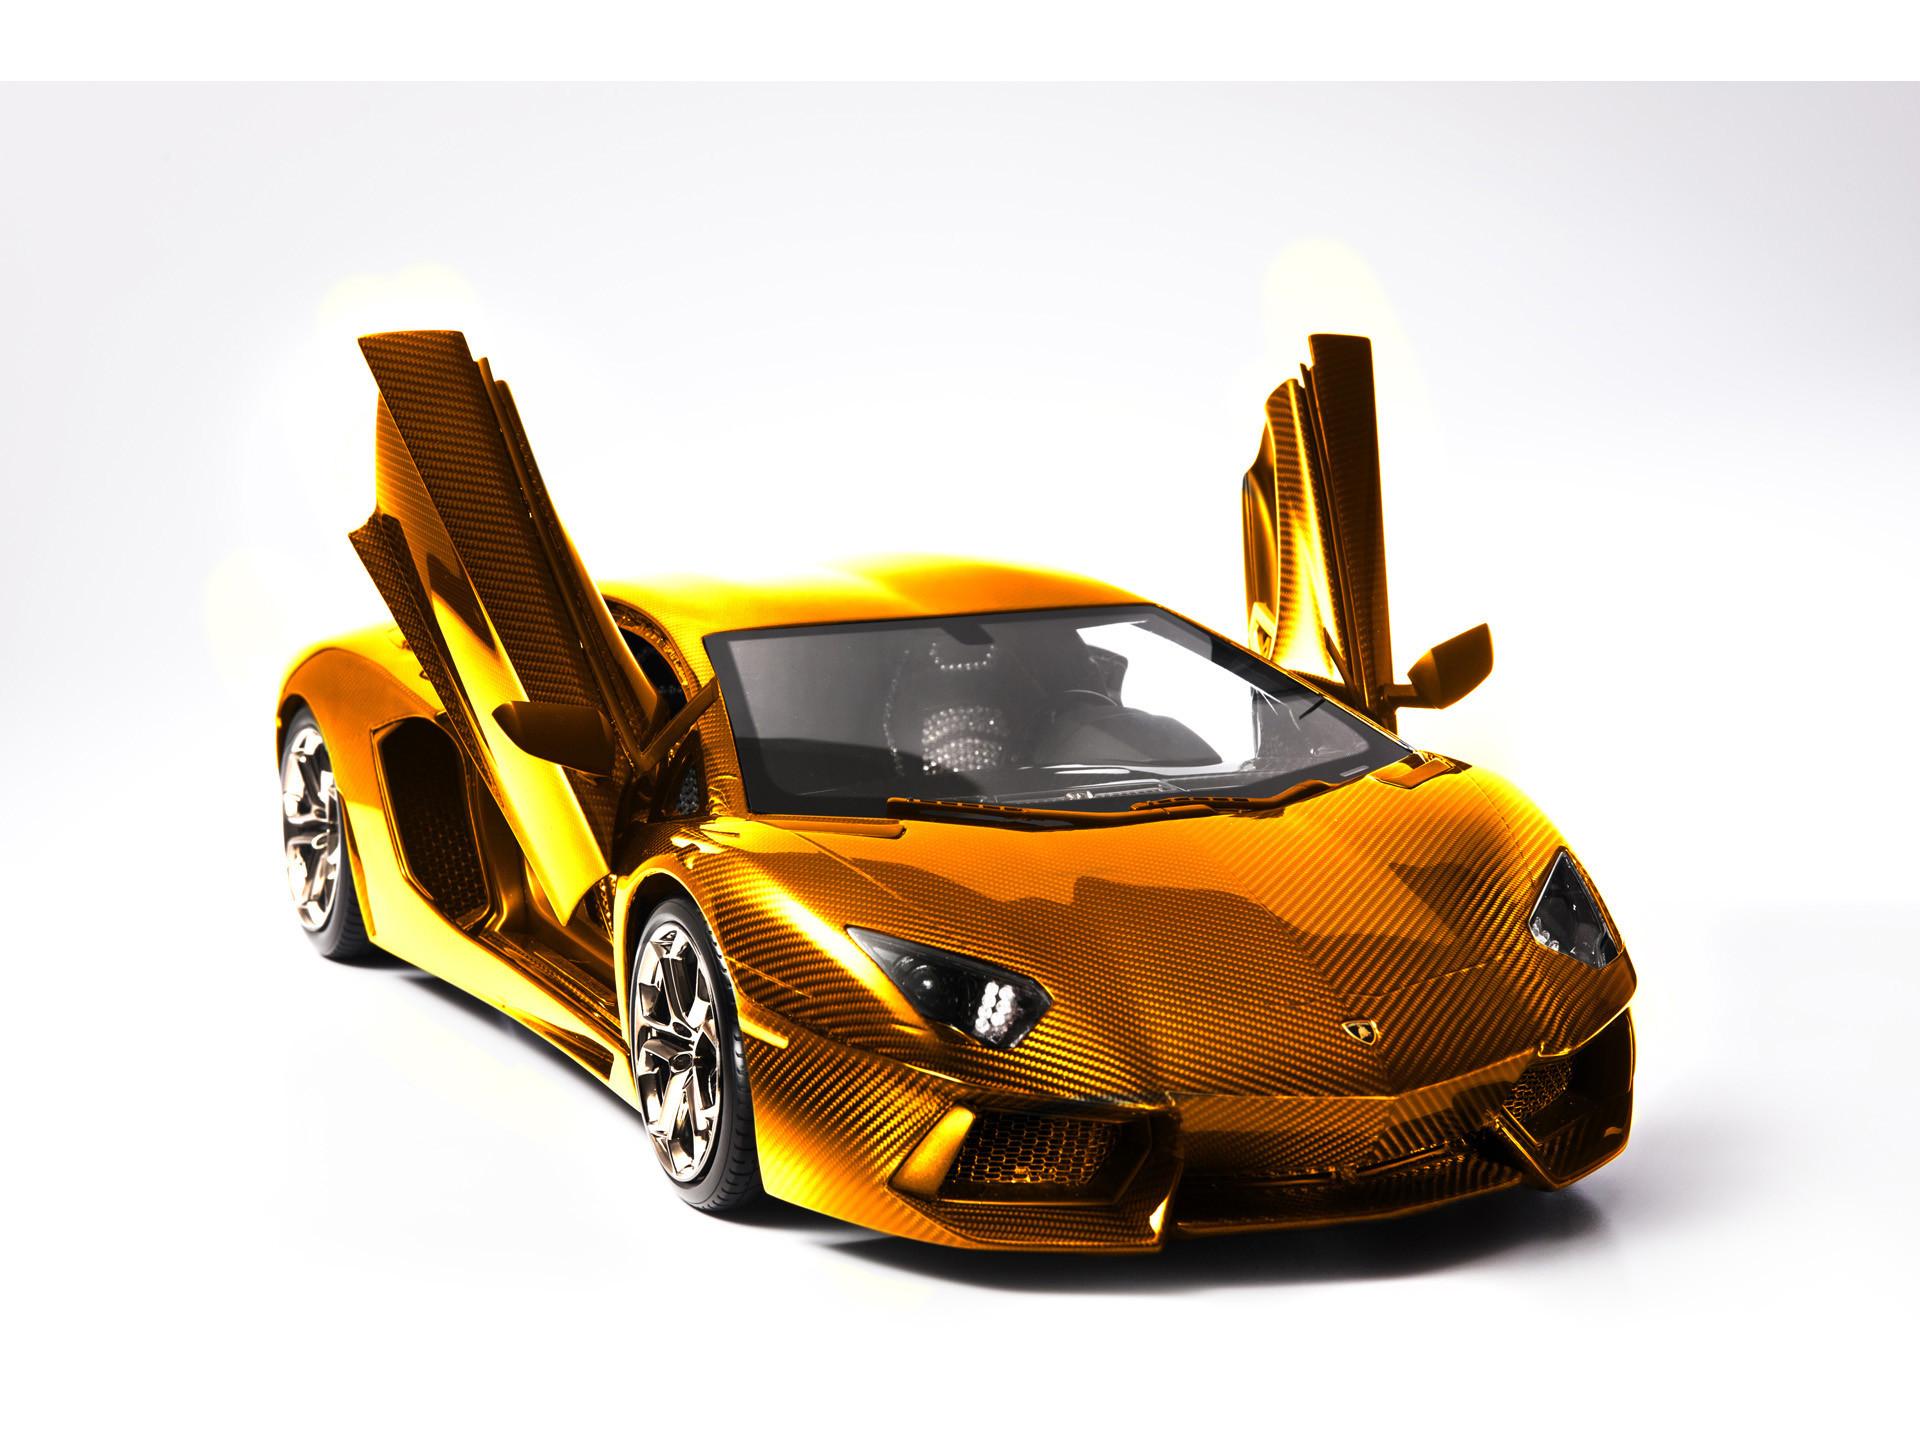 2012 Lamborghini Aventador LP 700-4 Model by Robert Gulpen Engineering –  Gold Front Angle Open Doors – – Wallpaper